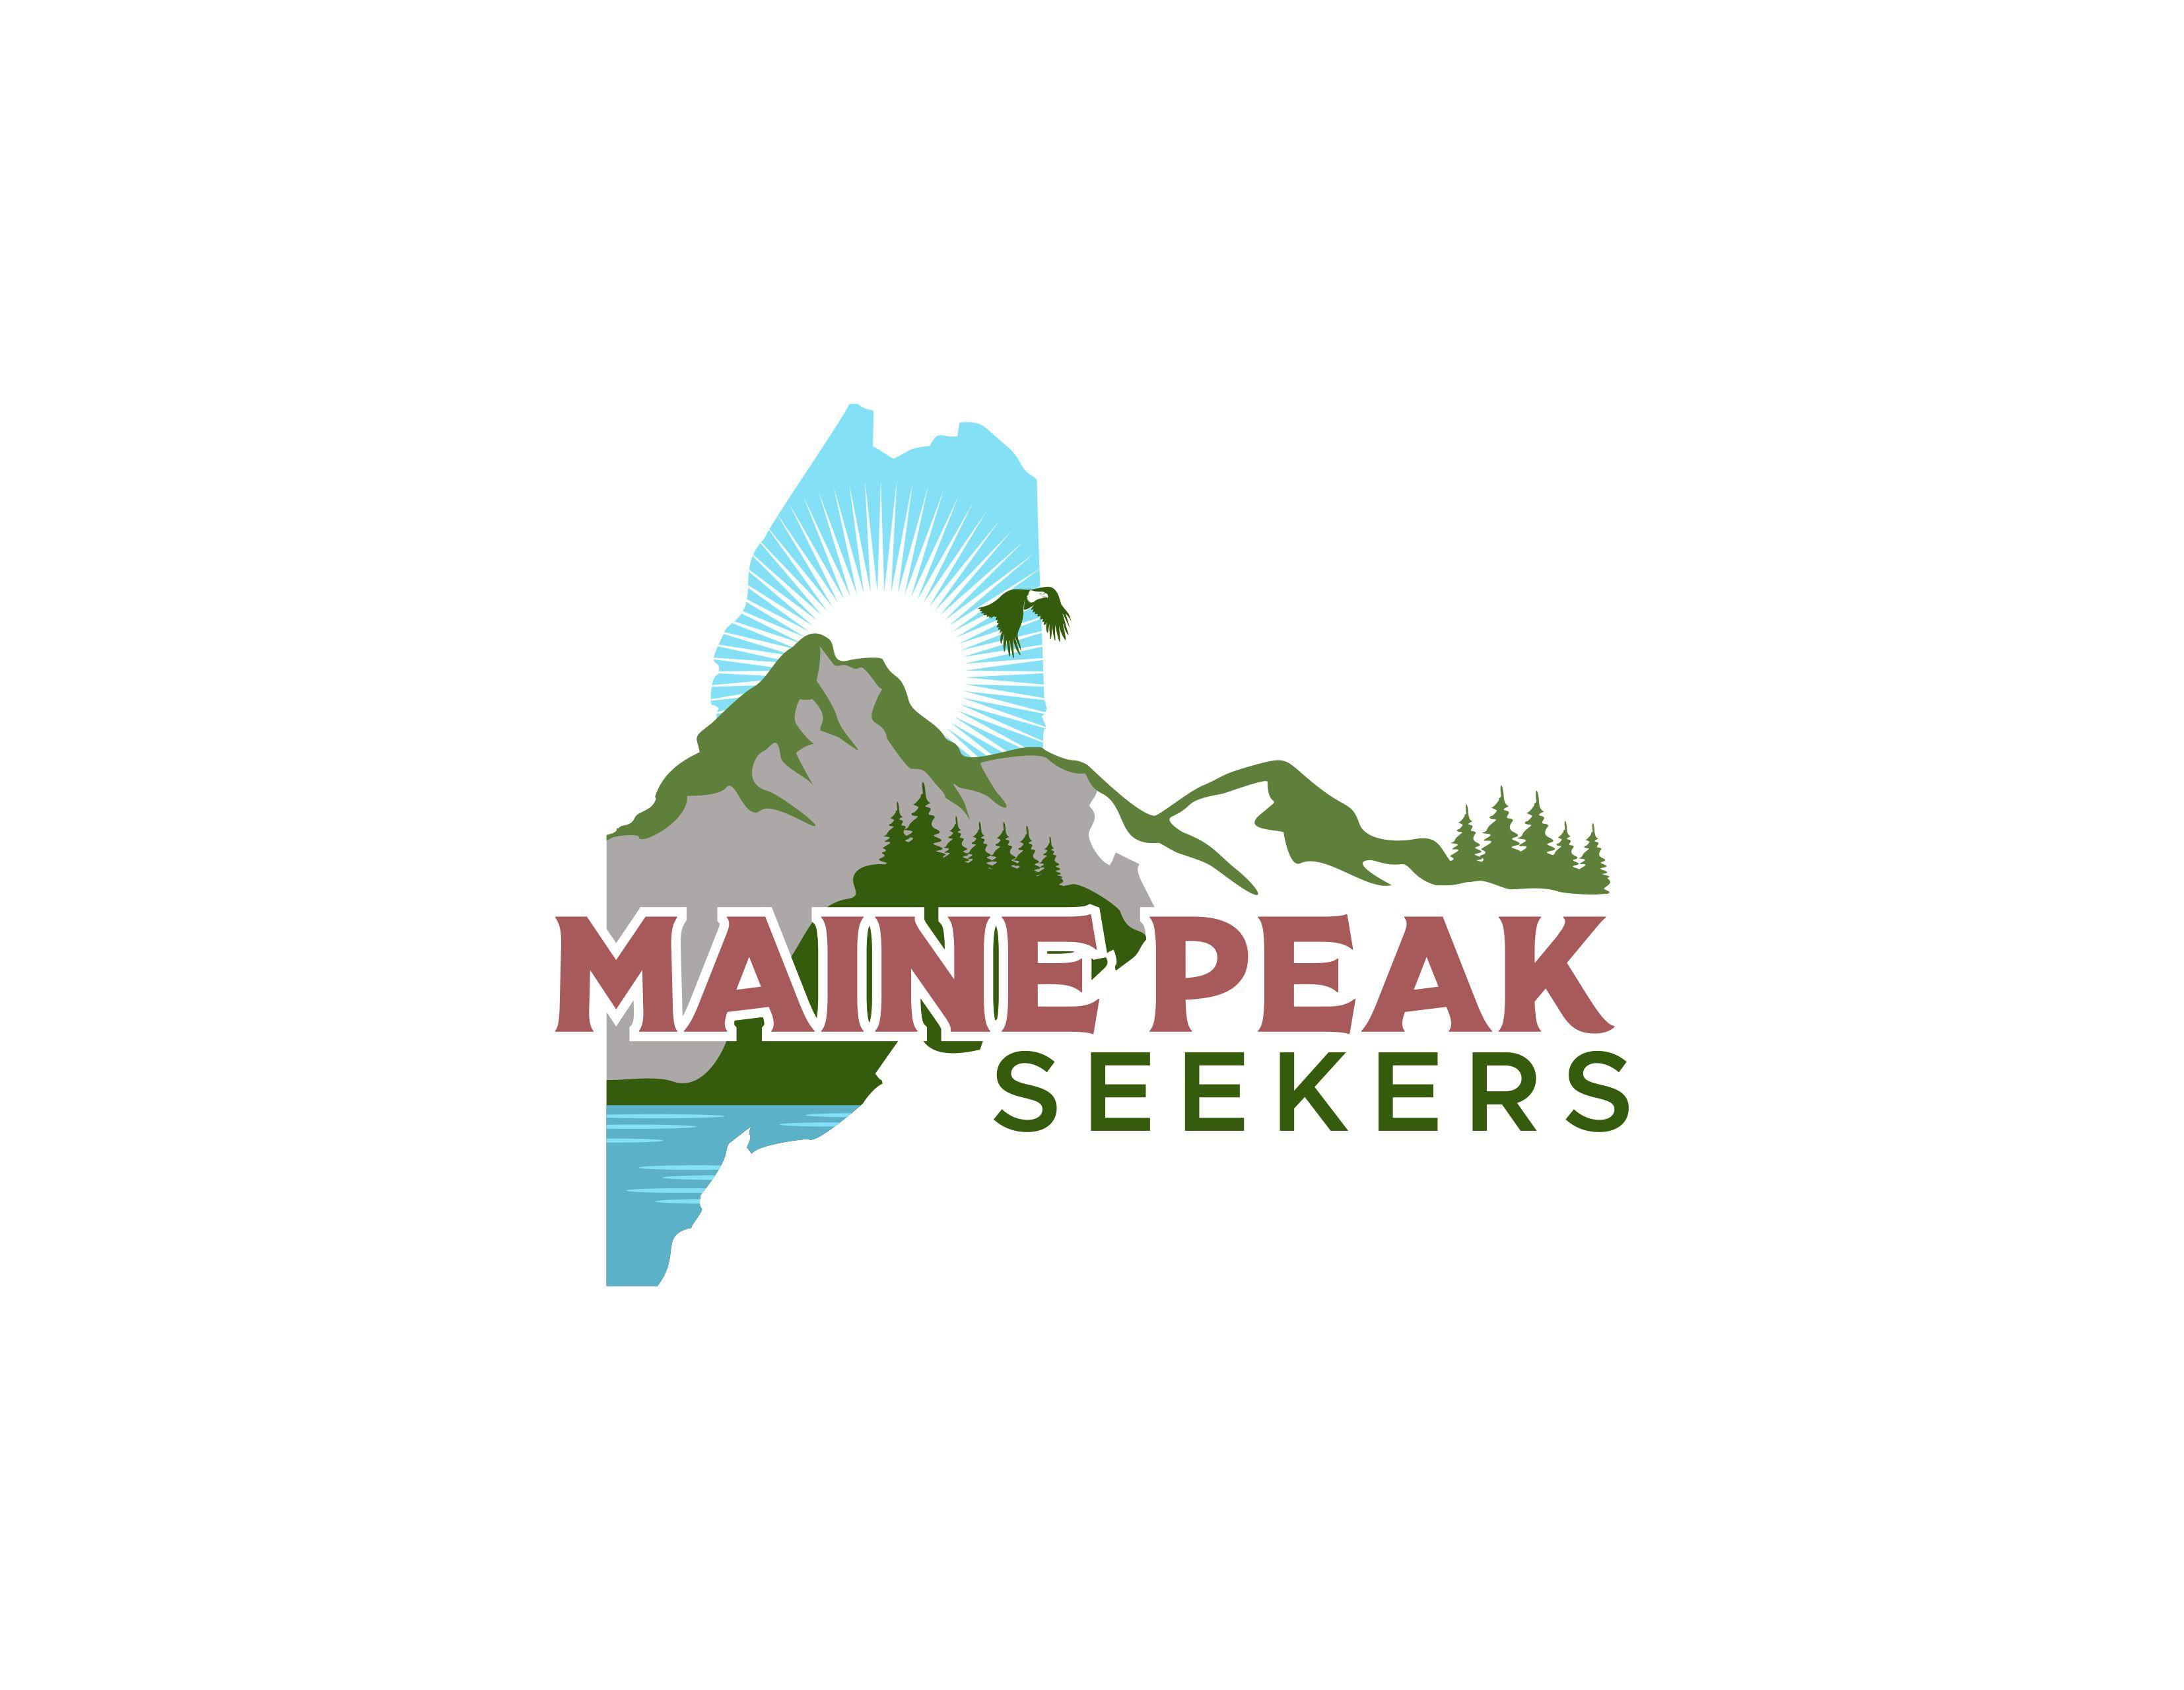 Classic meets youthful Maine hiking logo